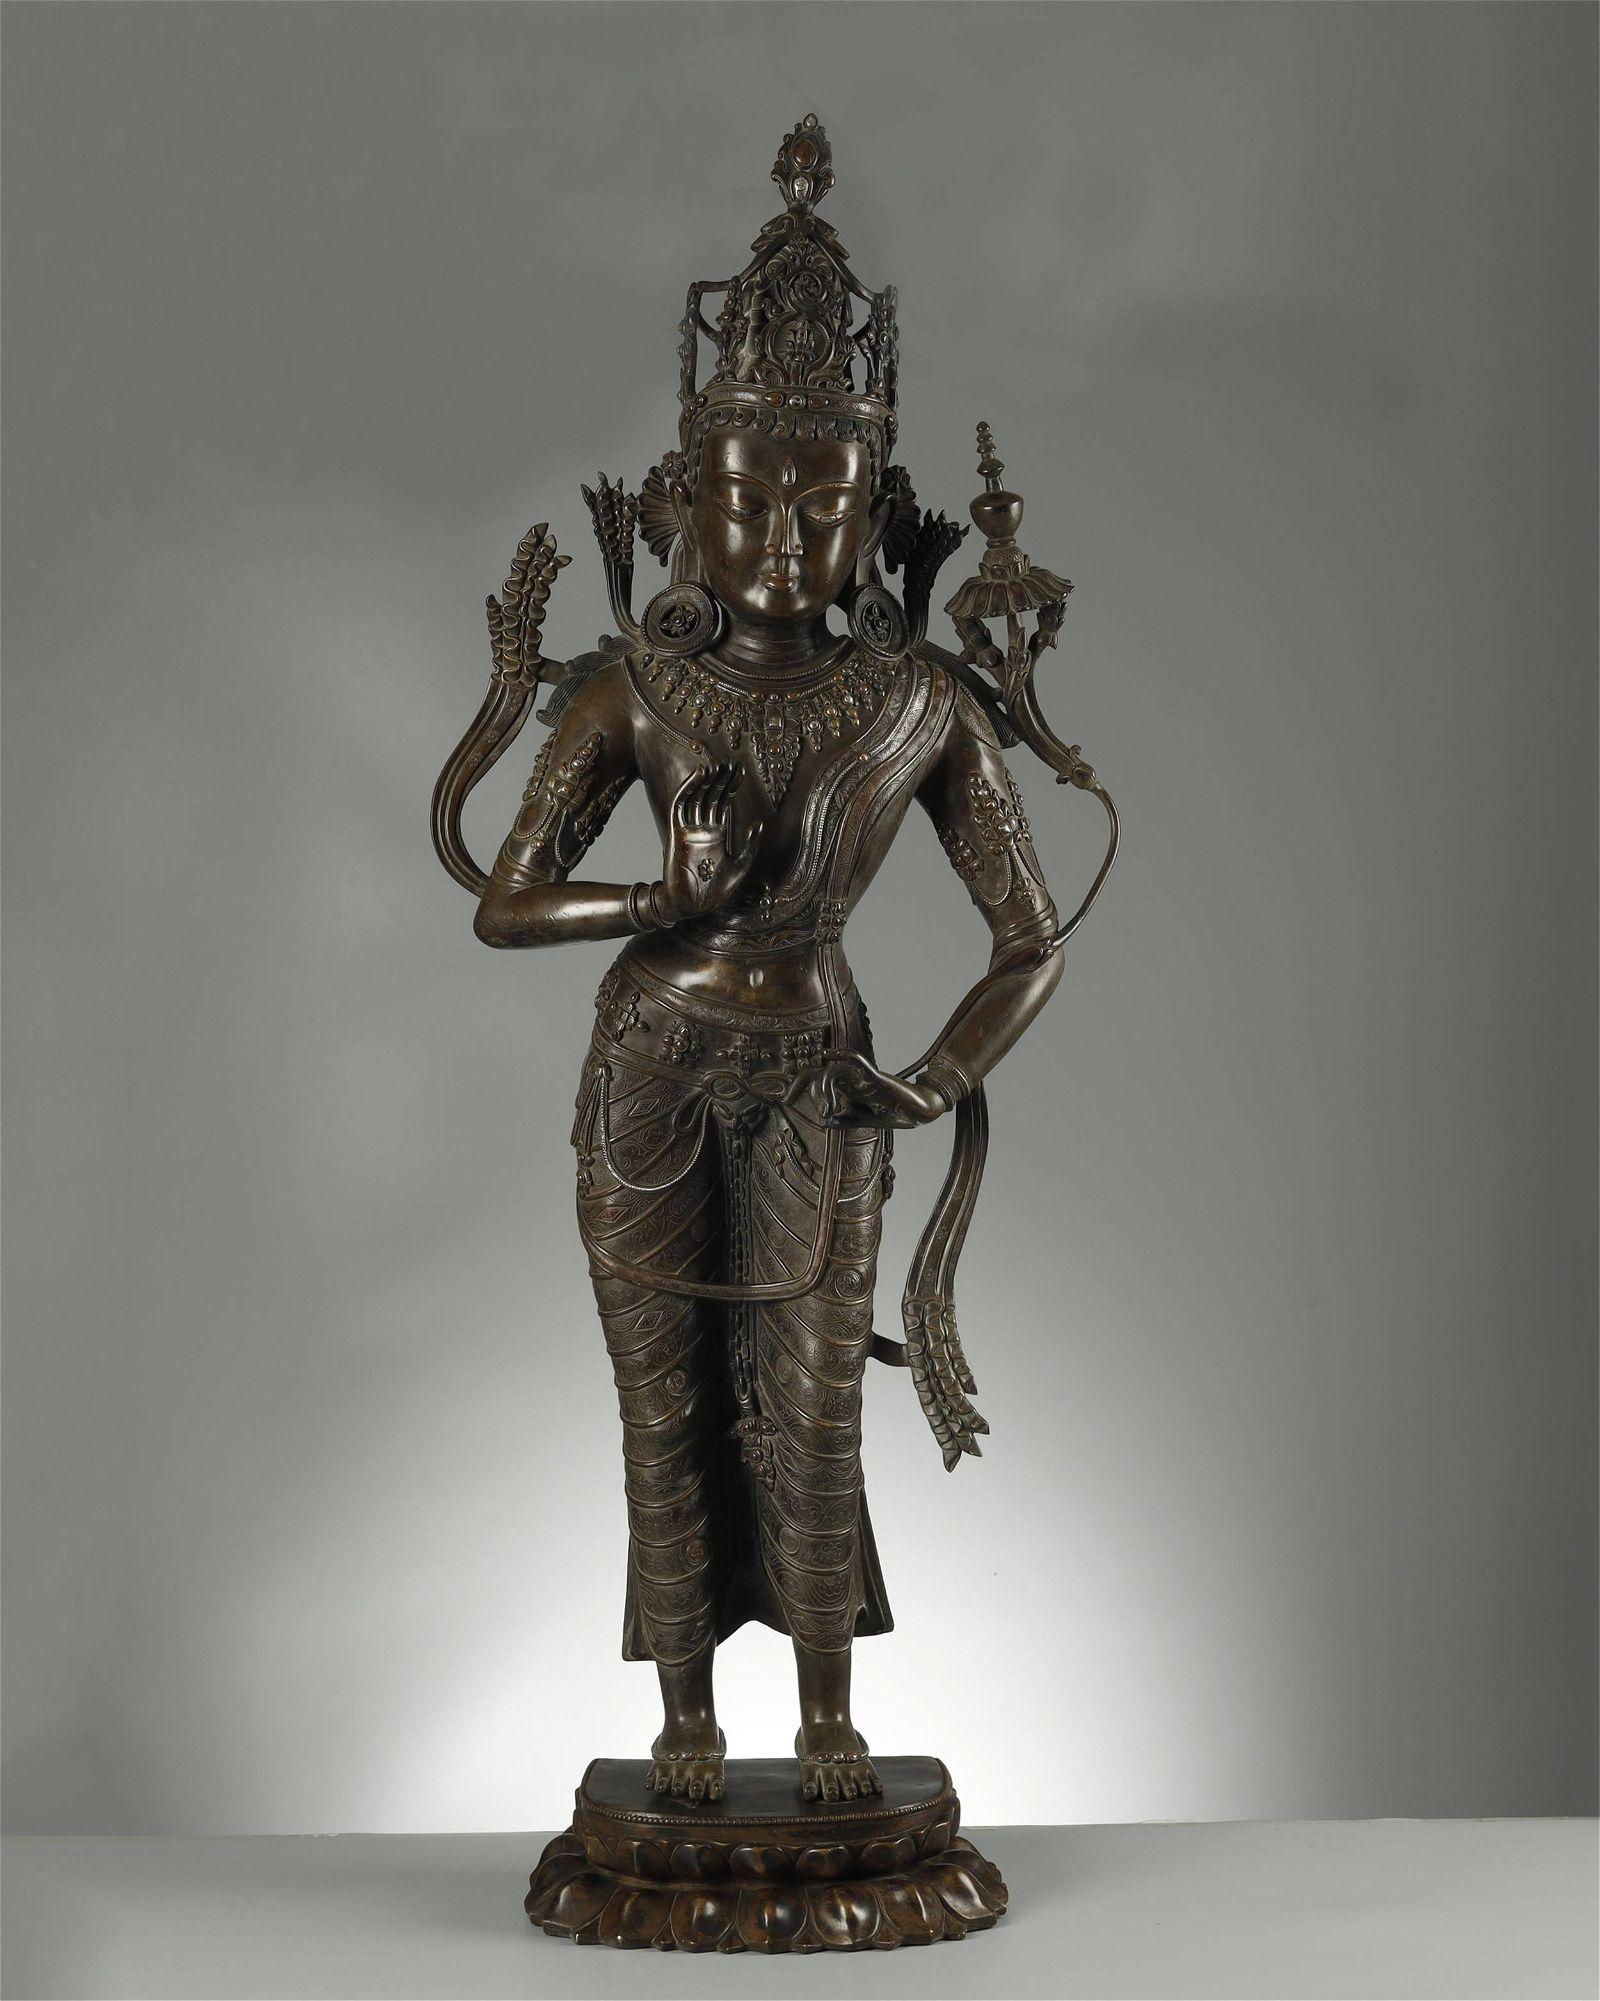 A FINE SILVER-INLAID BRONZE BUDDHA STATUE,QING